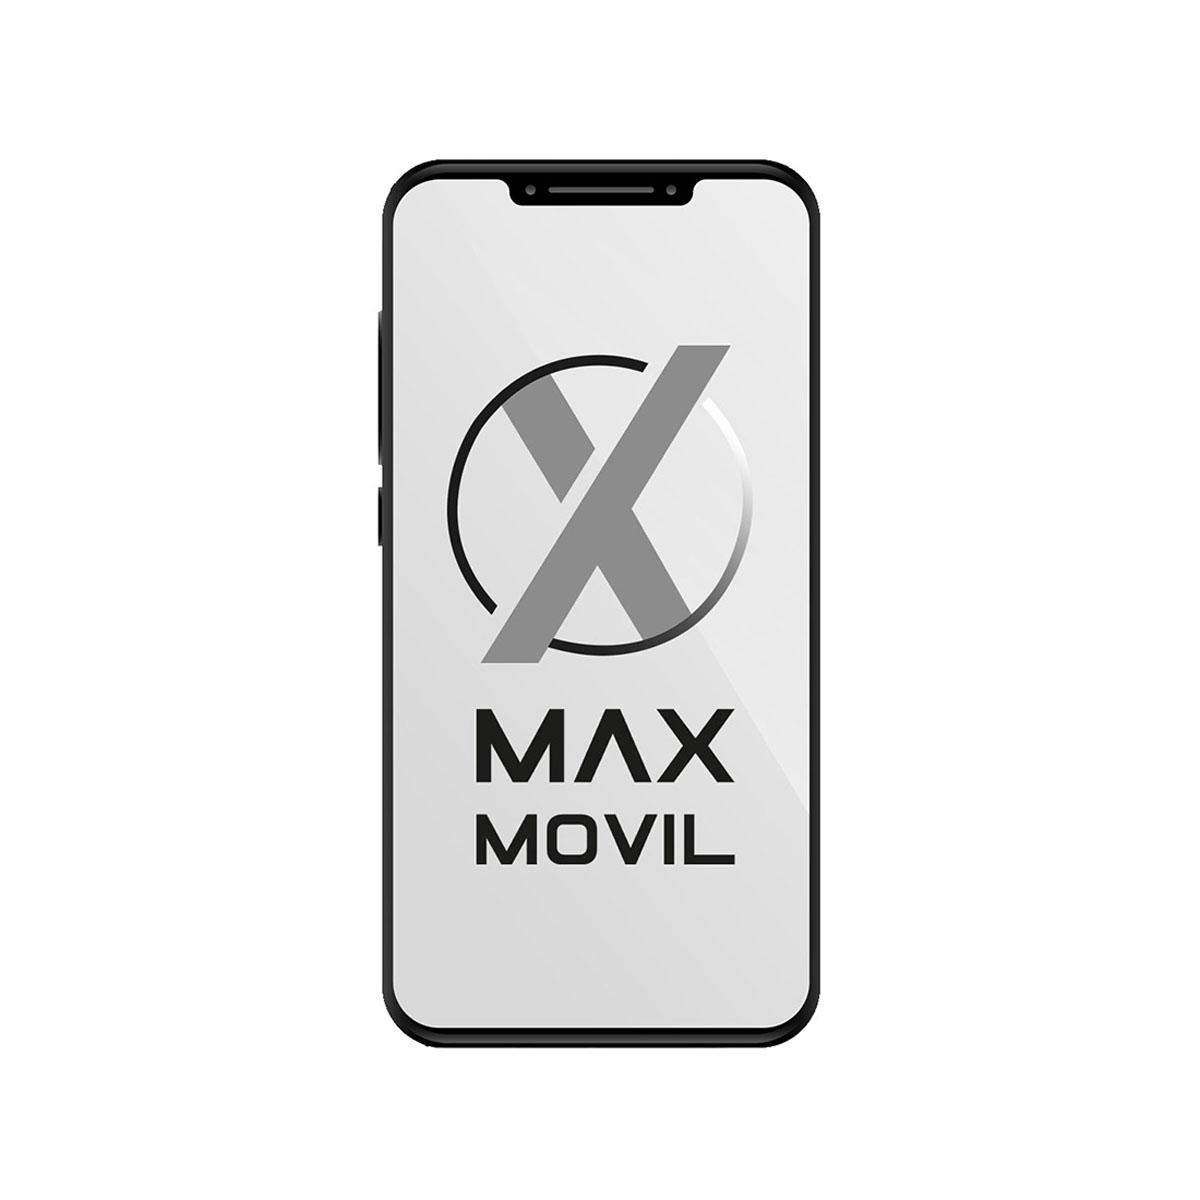 Cargador de pared blanco para iPhone 5